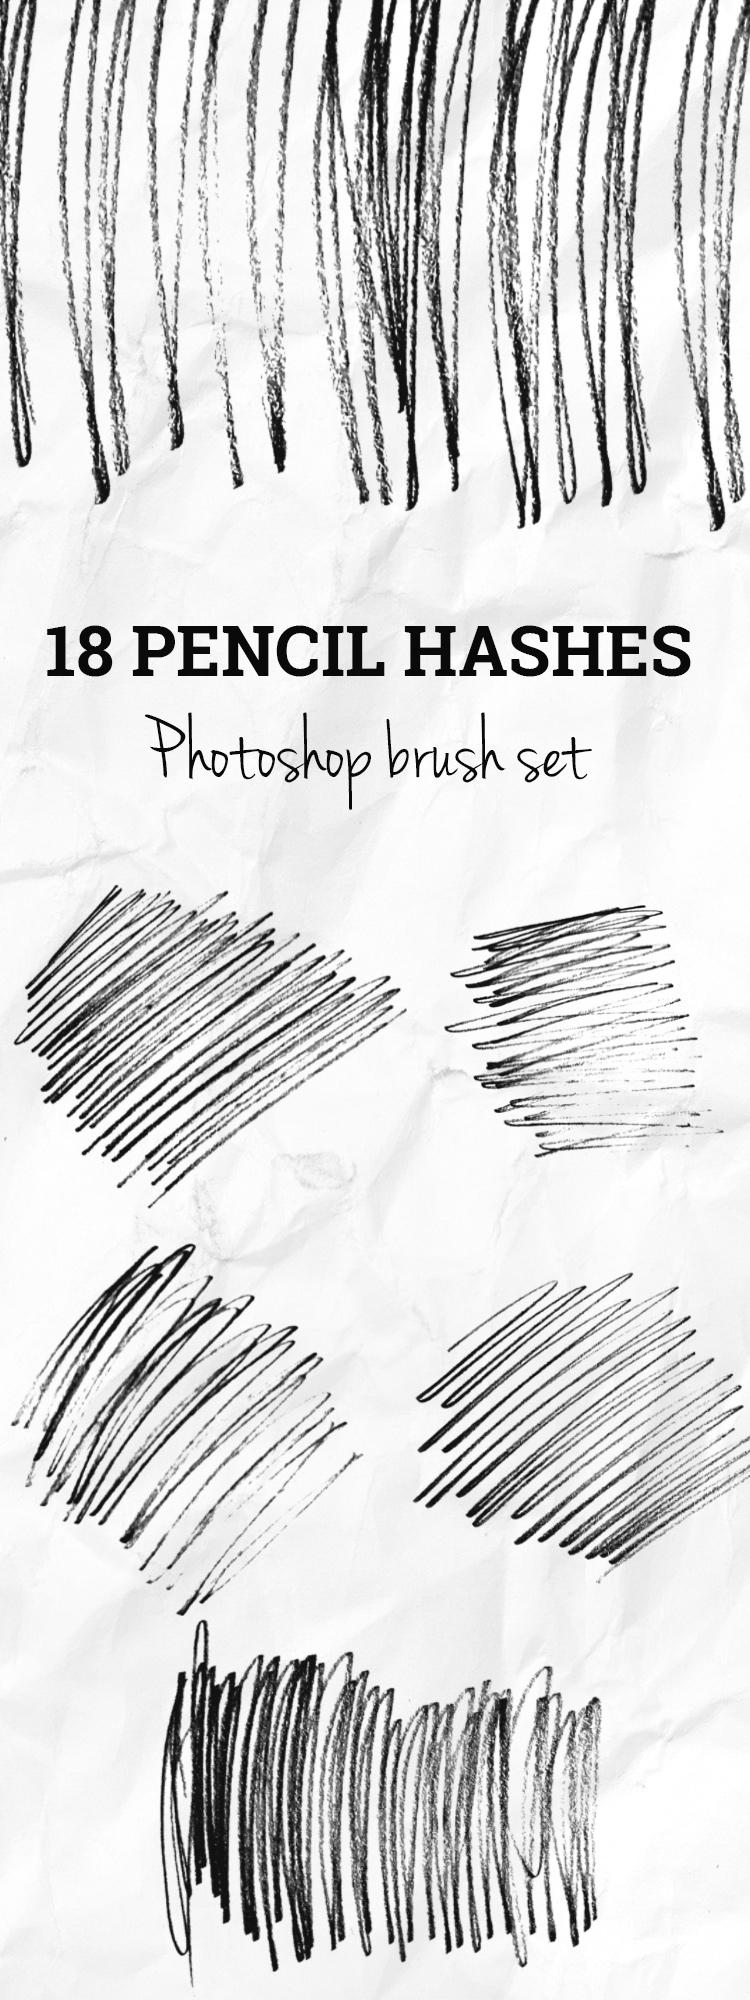 Premium members: 18 Pencil hashes Photoshop brush set | Creative Nerds